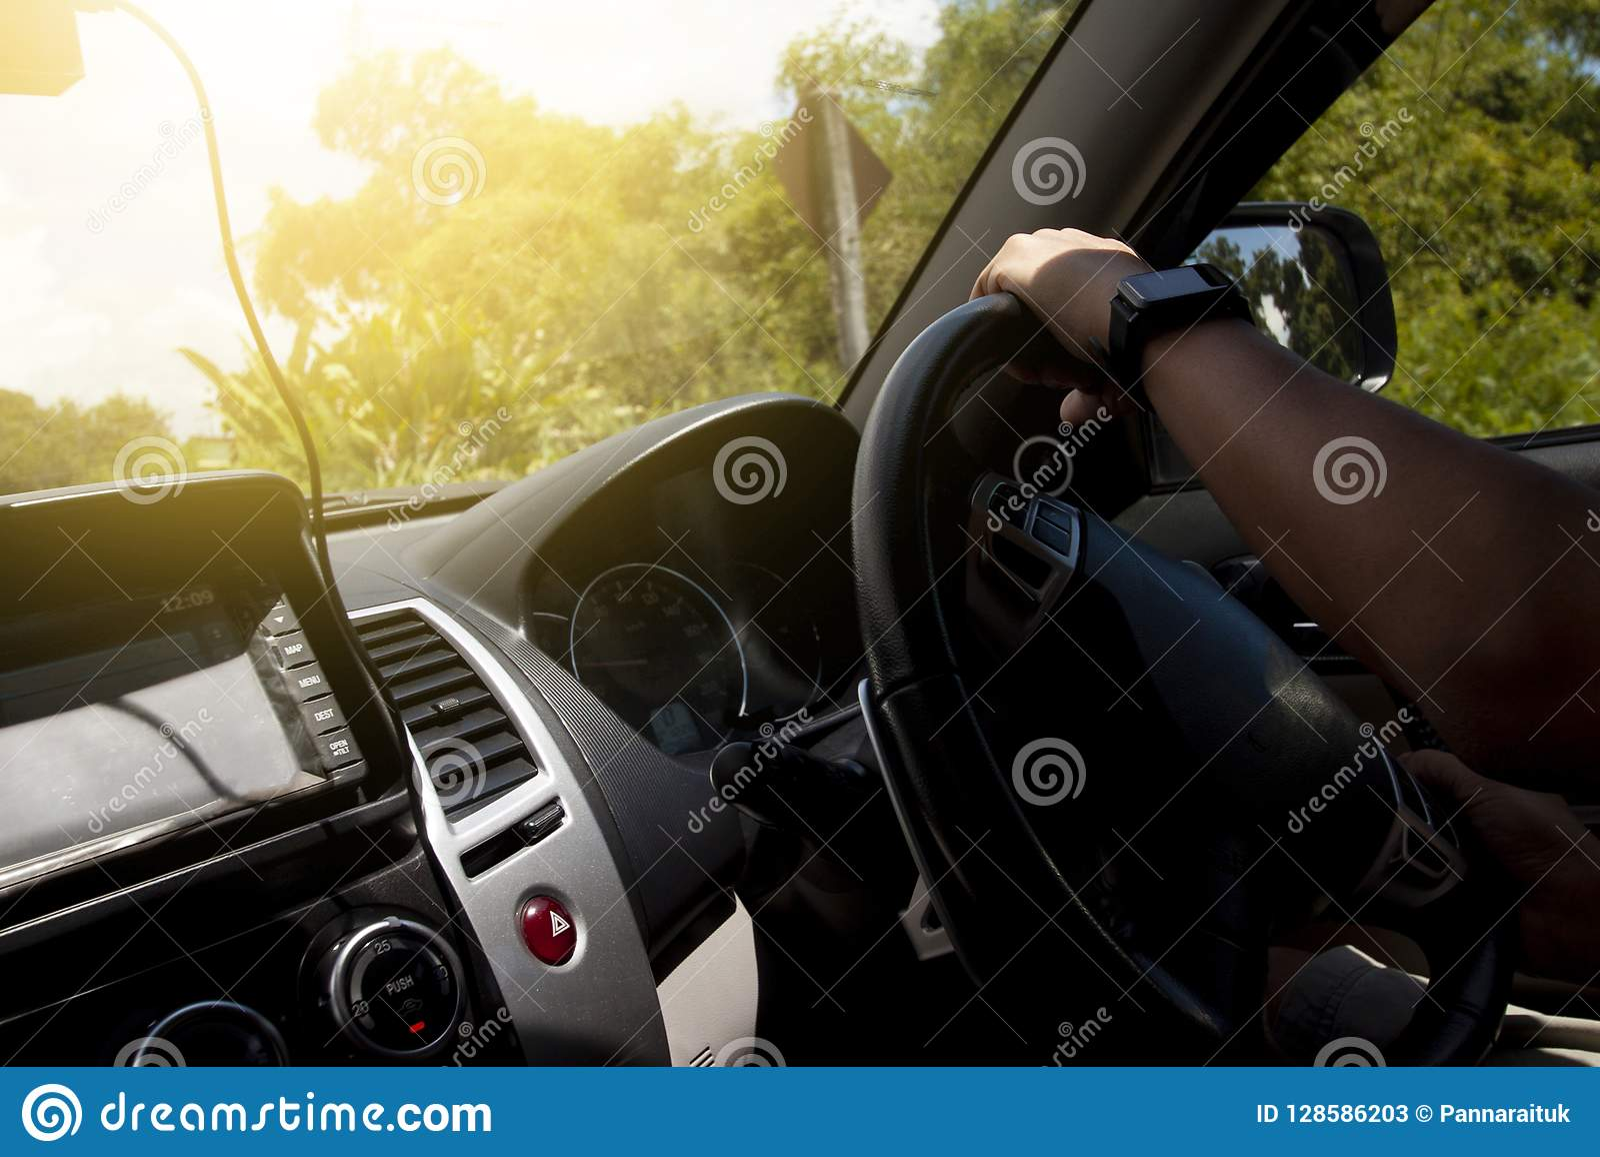 Hand of man driving inside car.